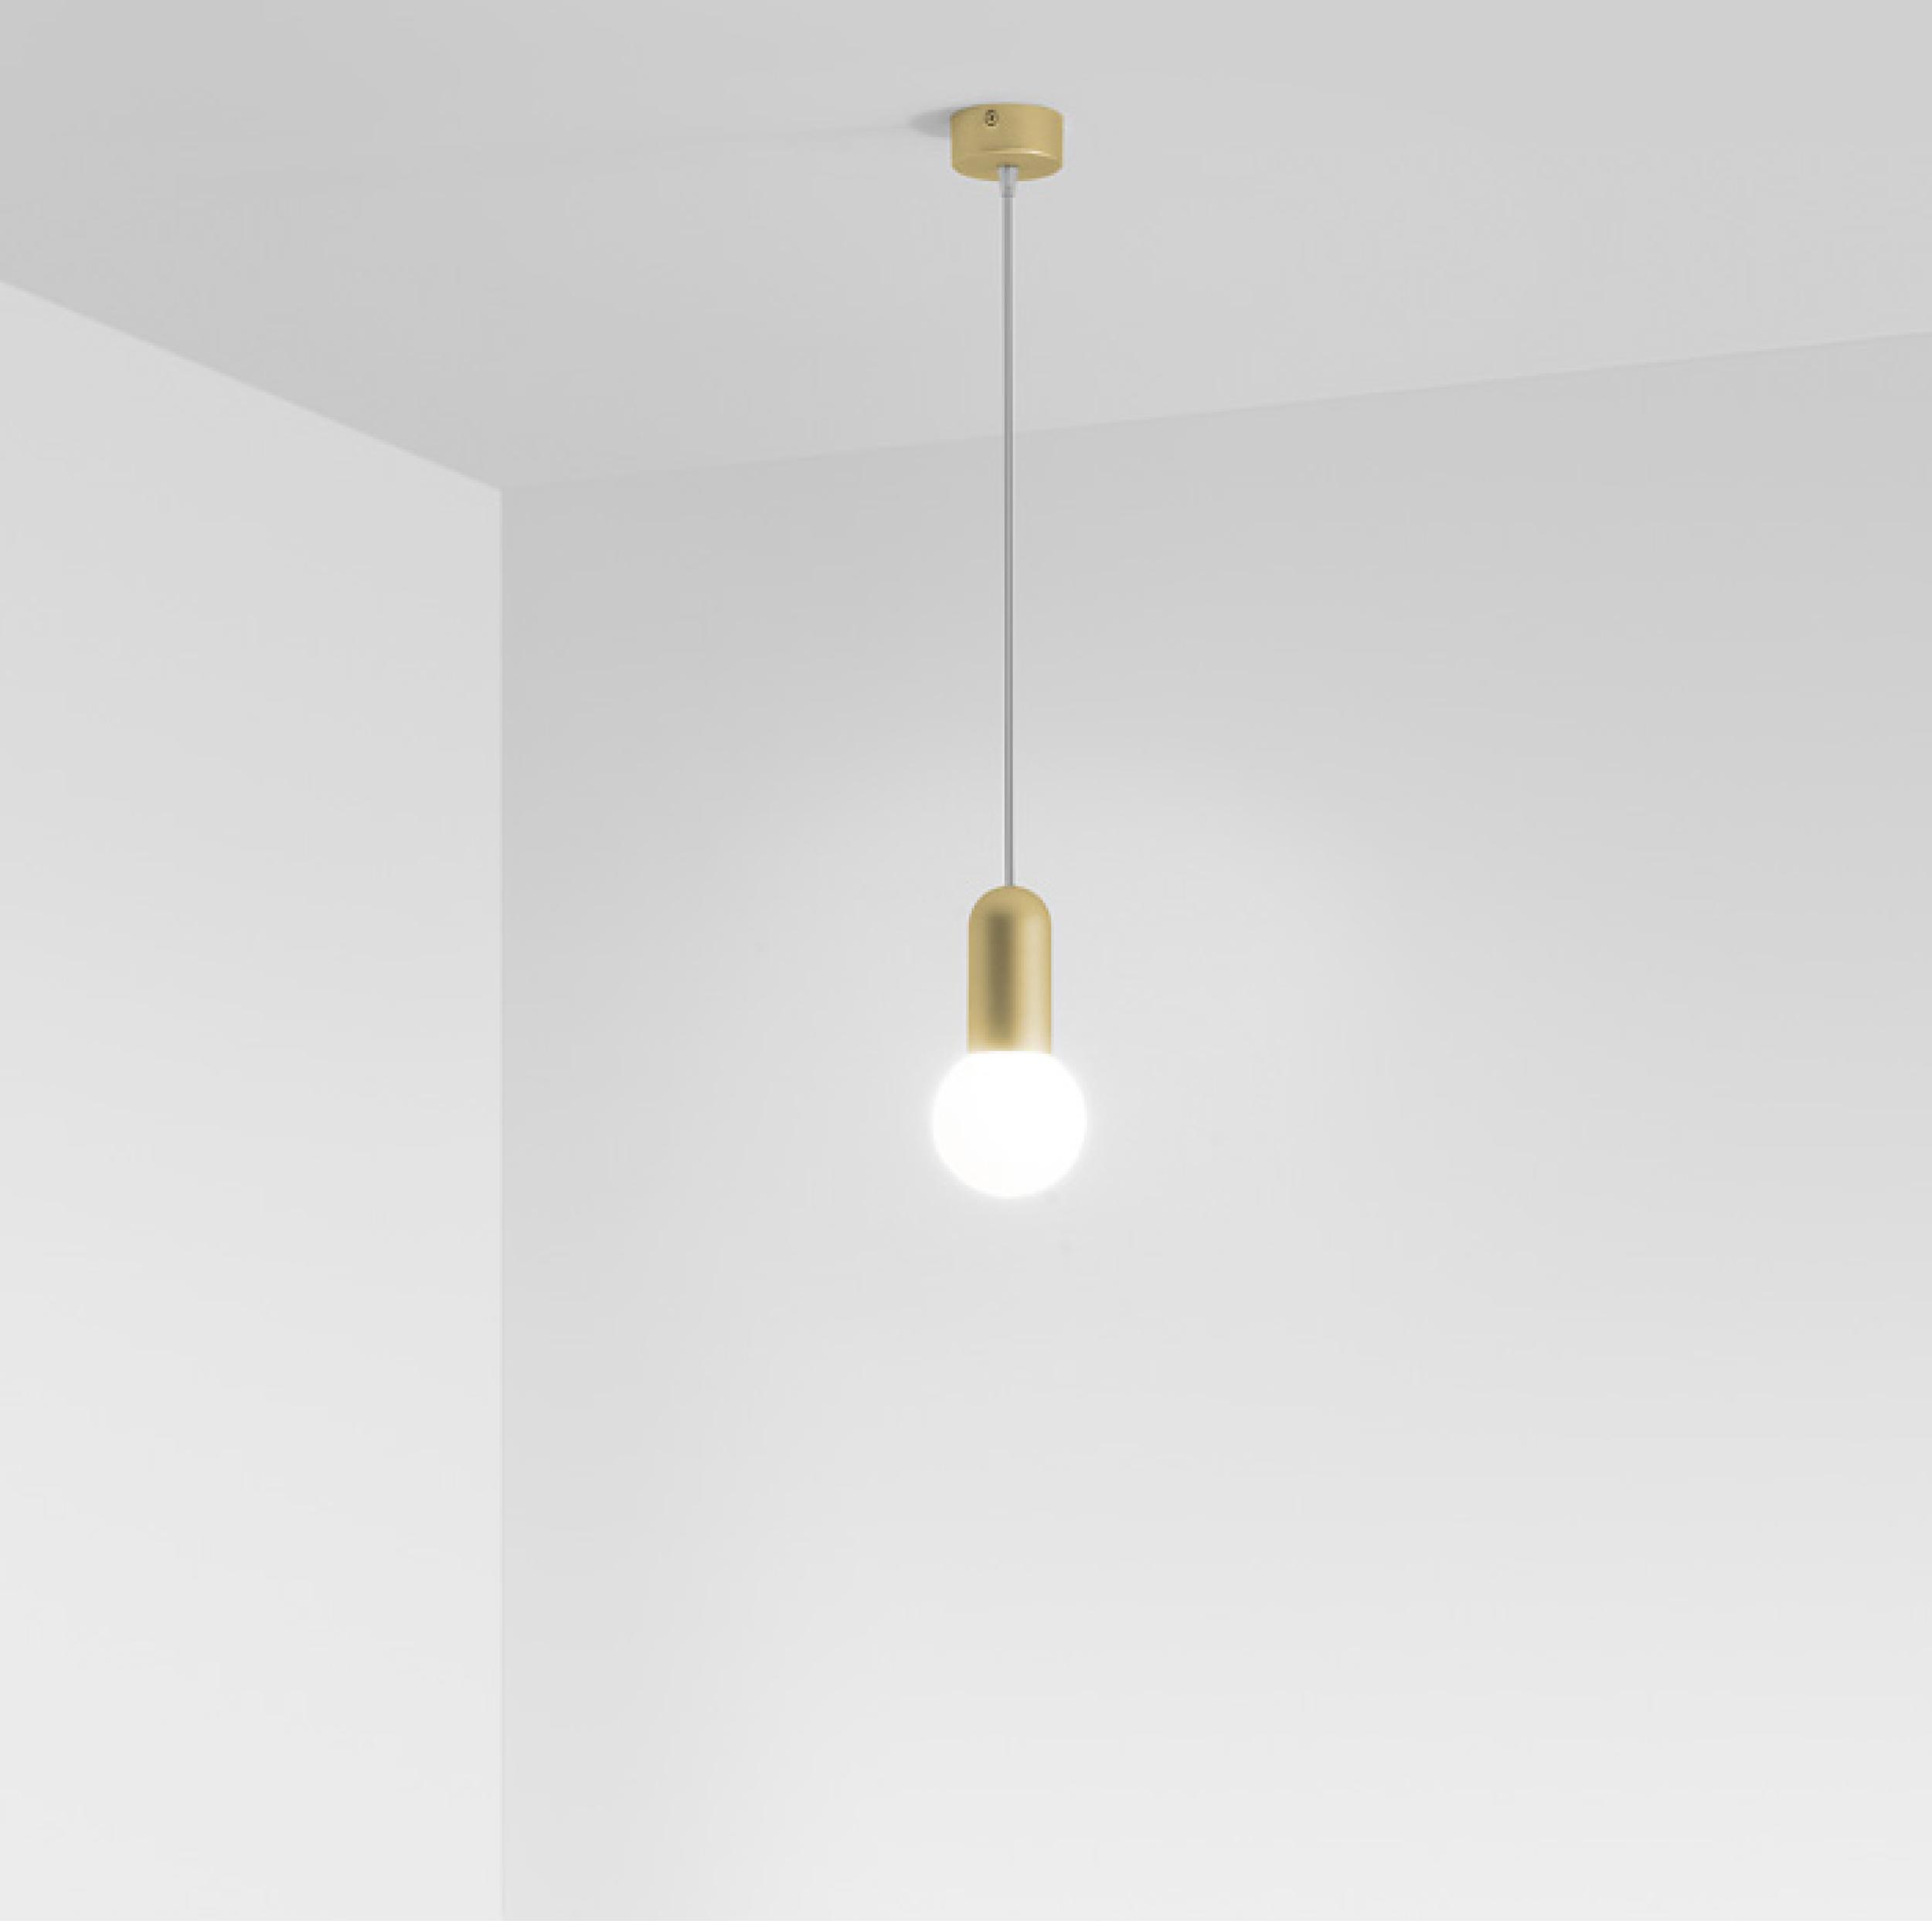 HD3 Pendant Lamp in gold